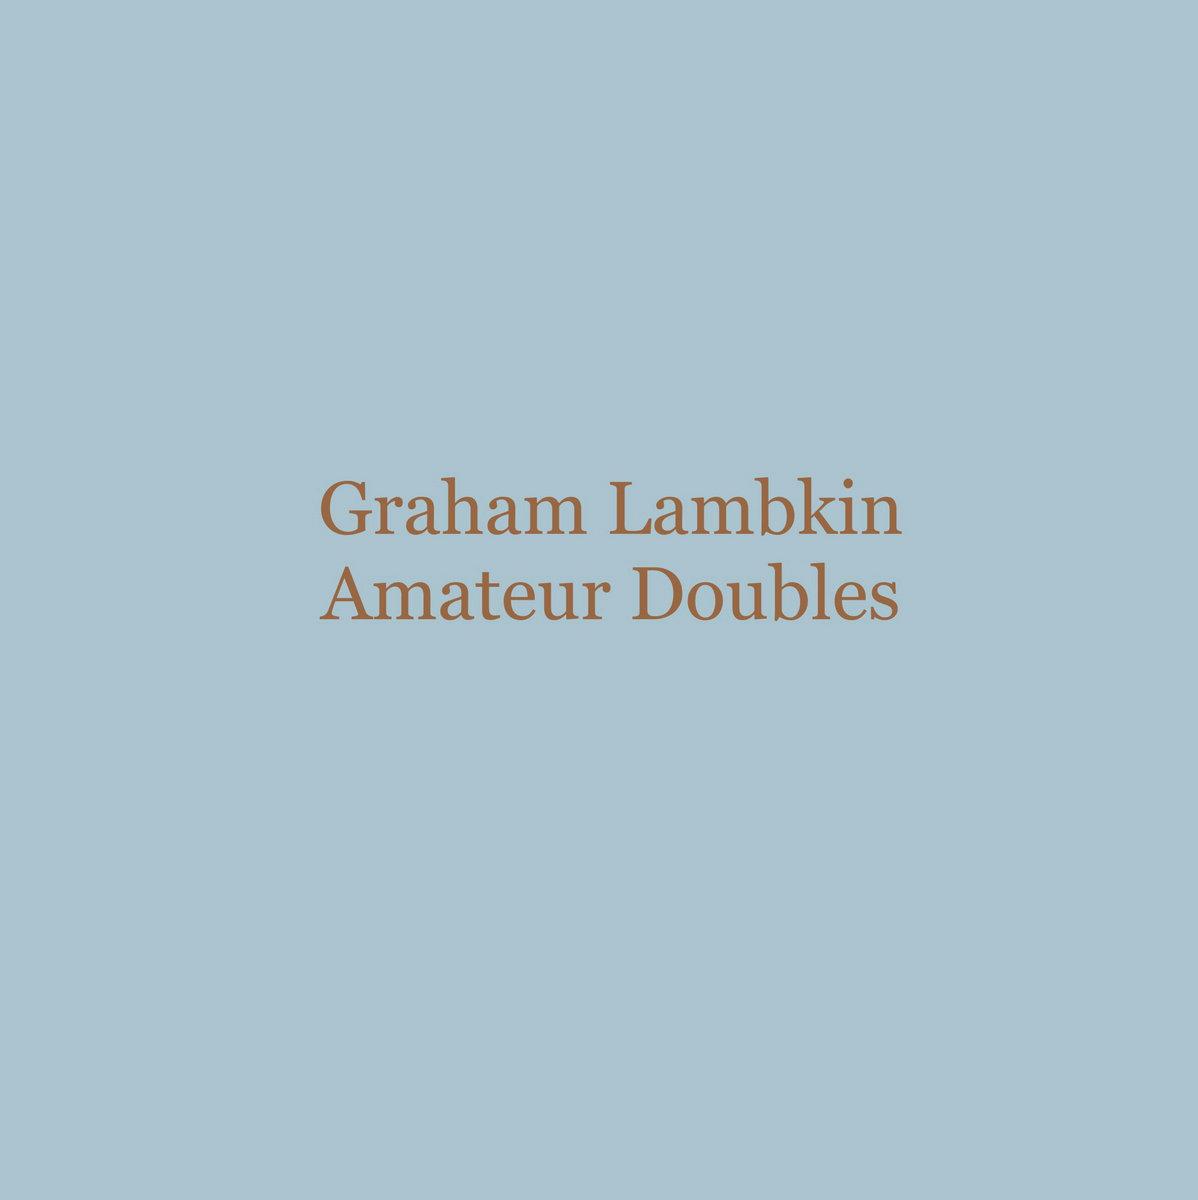 Image result for amateur doubles